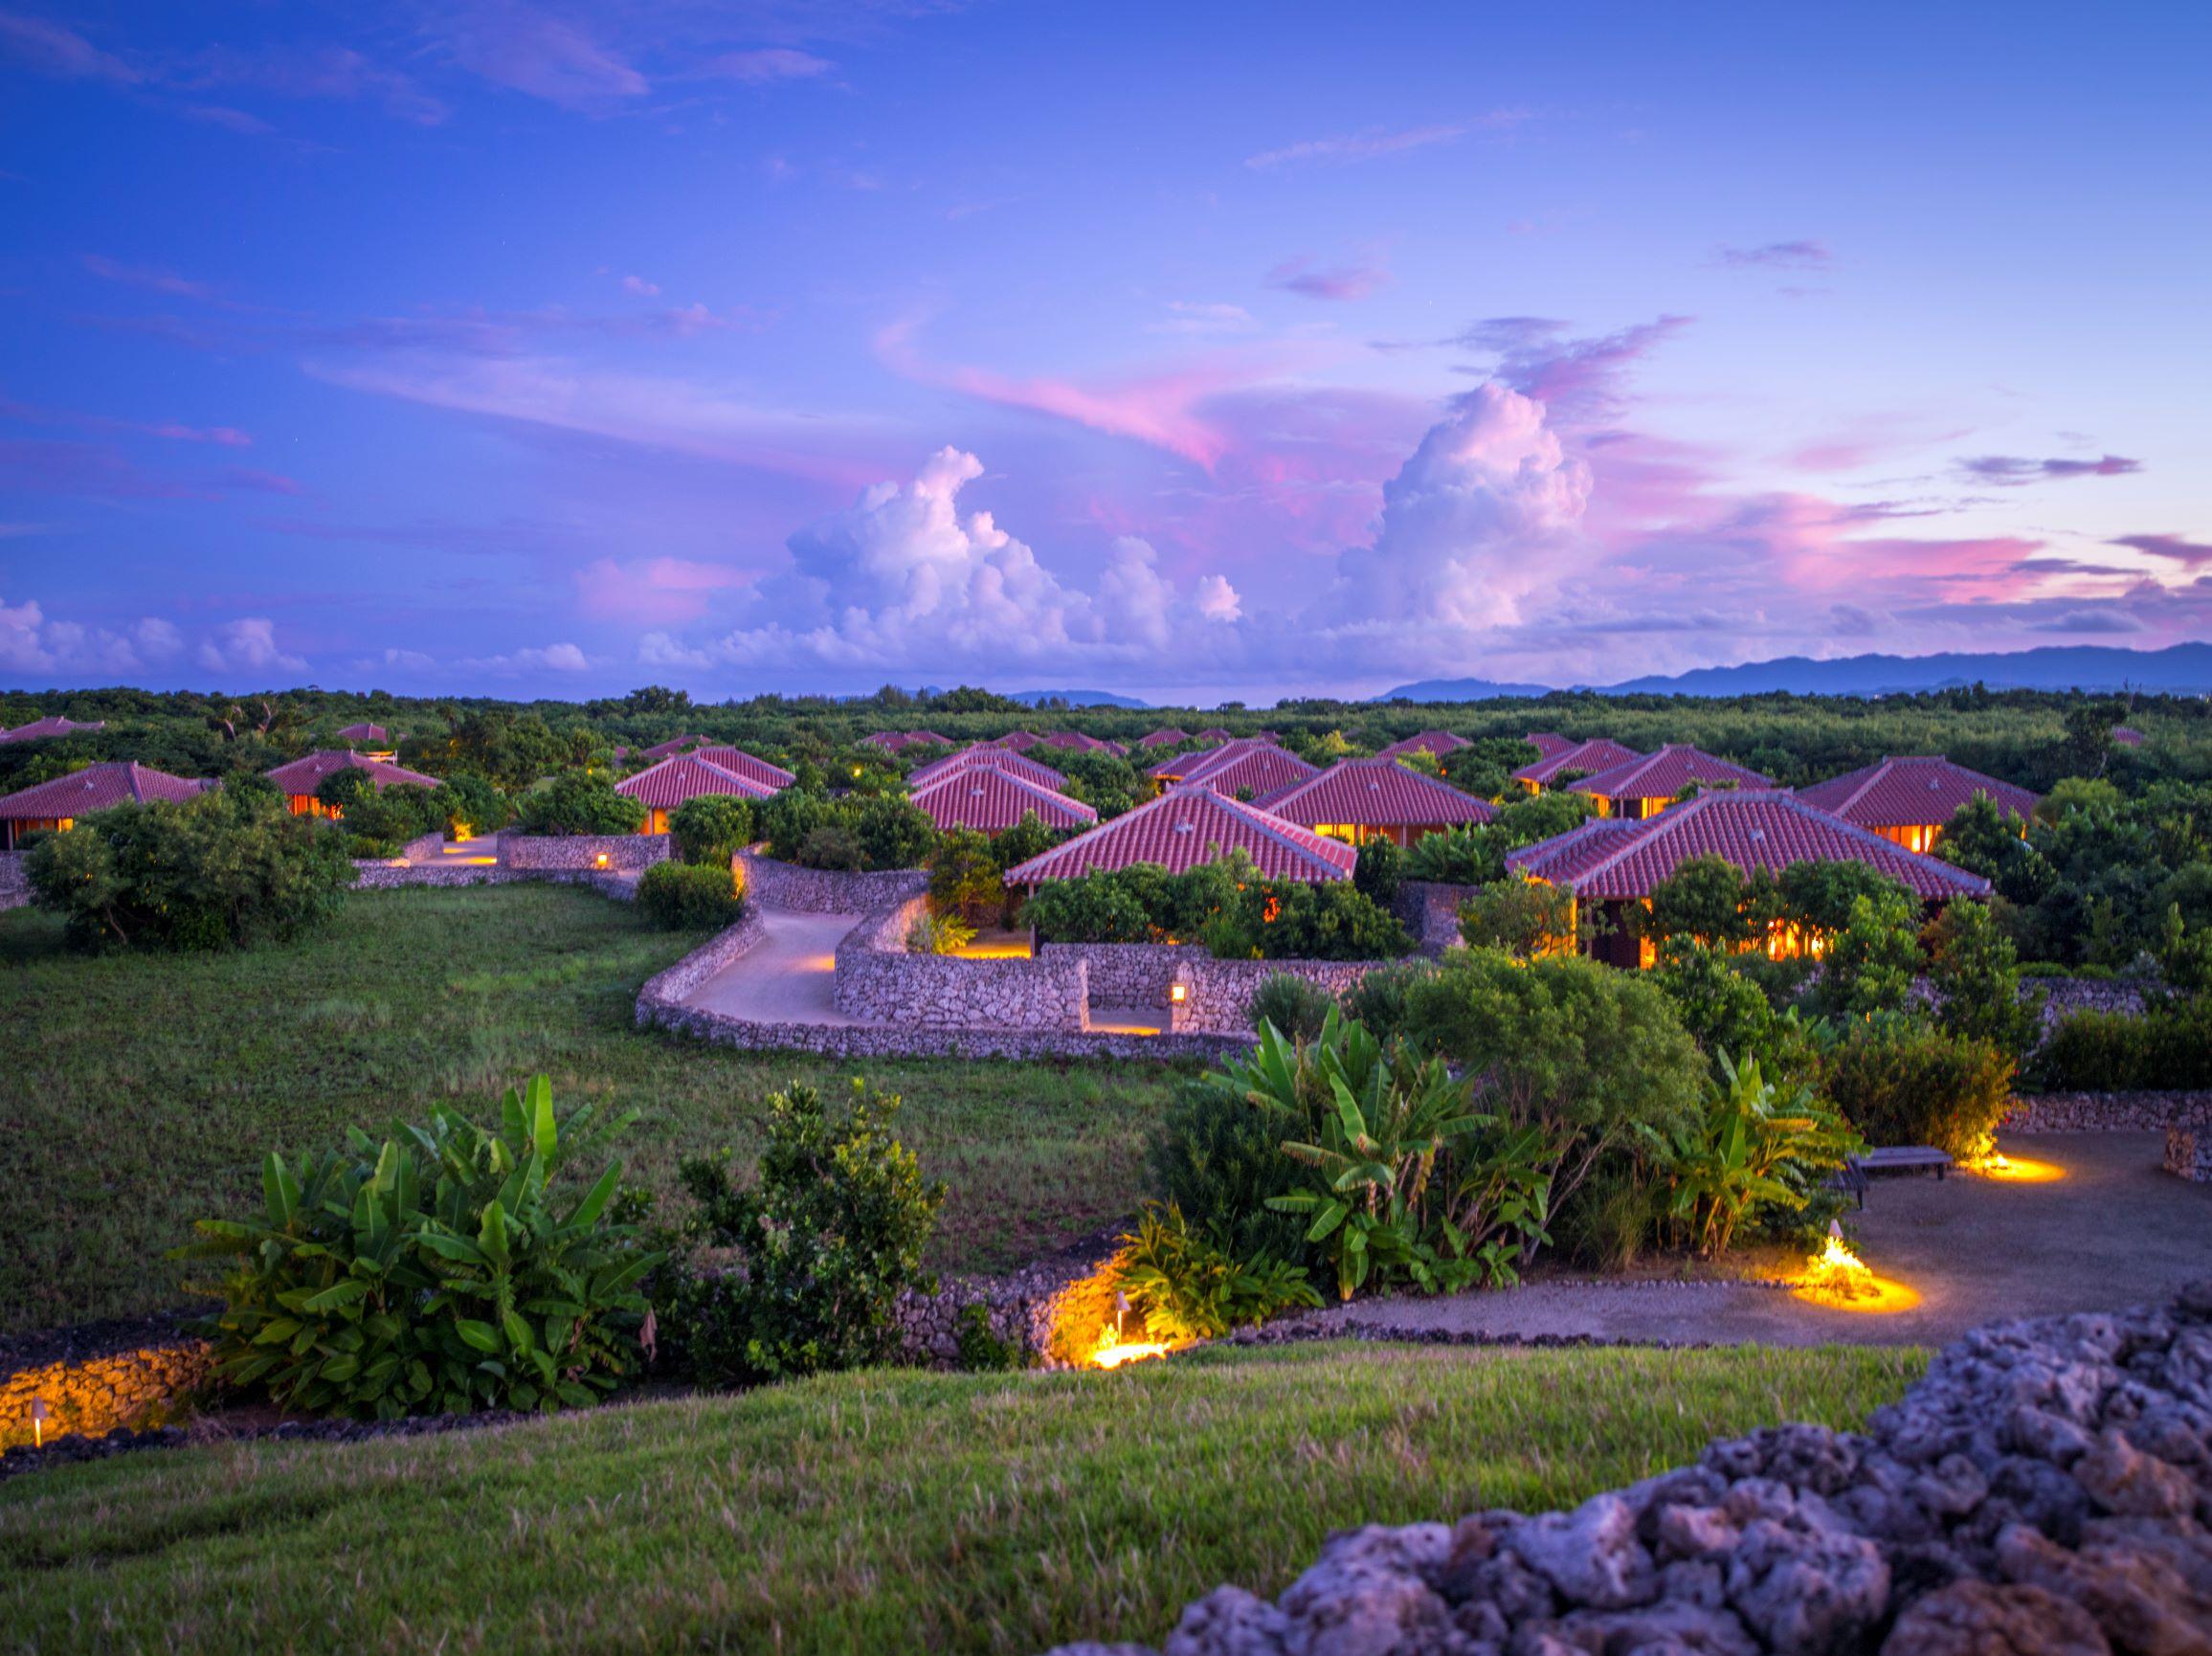 Enjoy 5-star resorts in Okinawa.